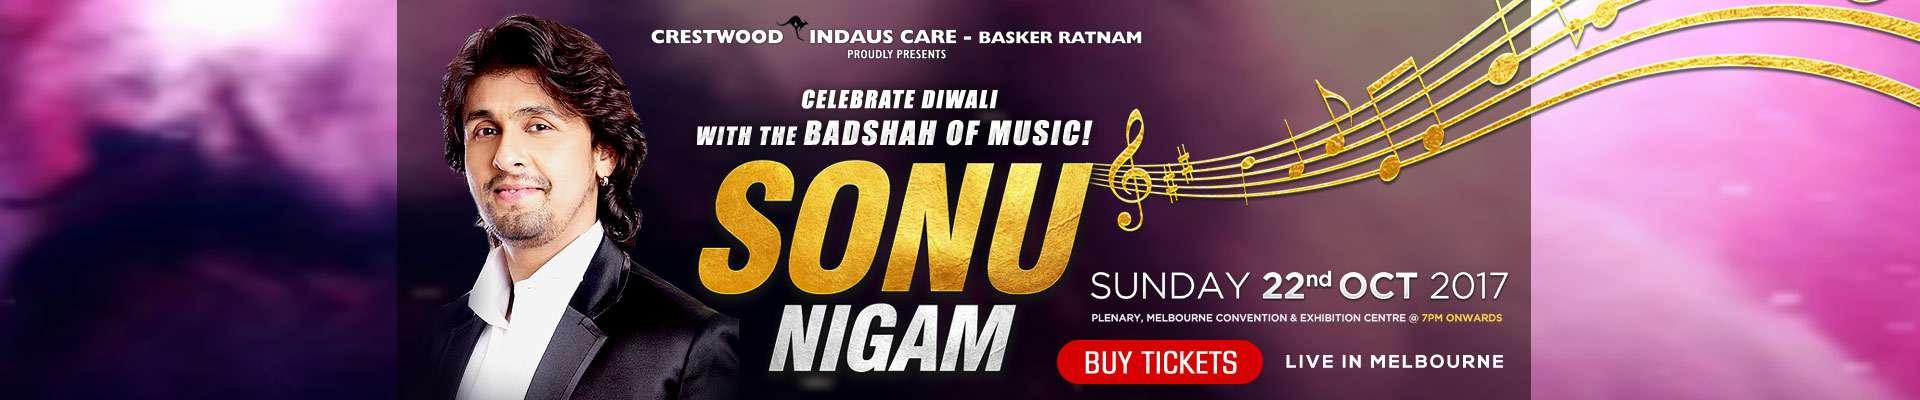 Sonu Nigam Live In Melbourne 2017 - DryTickets.com.au